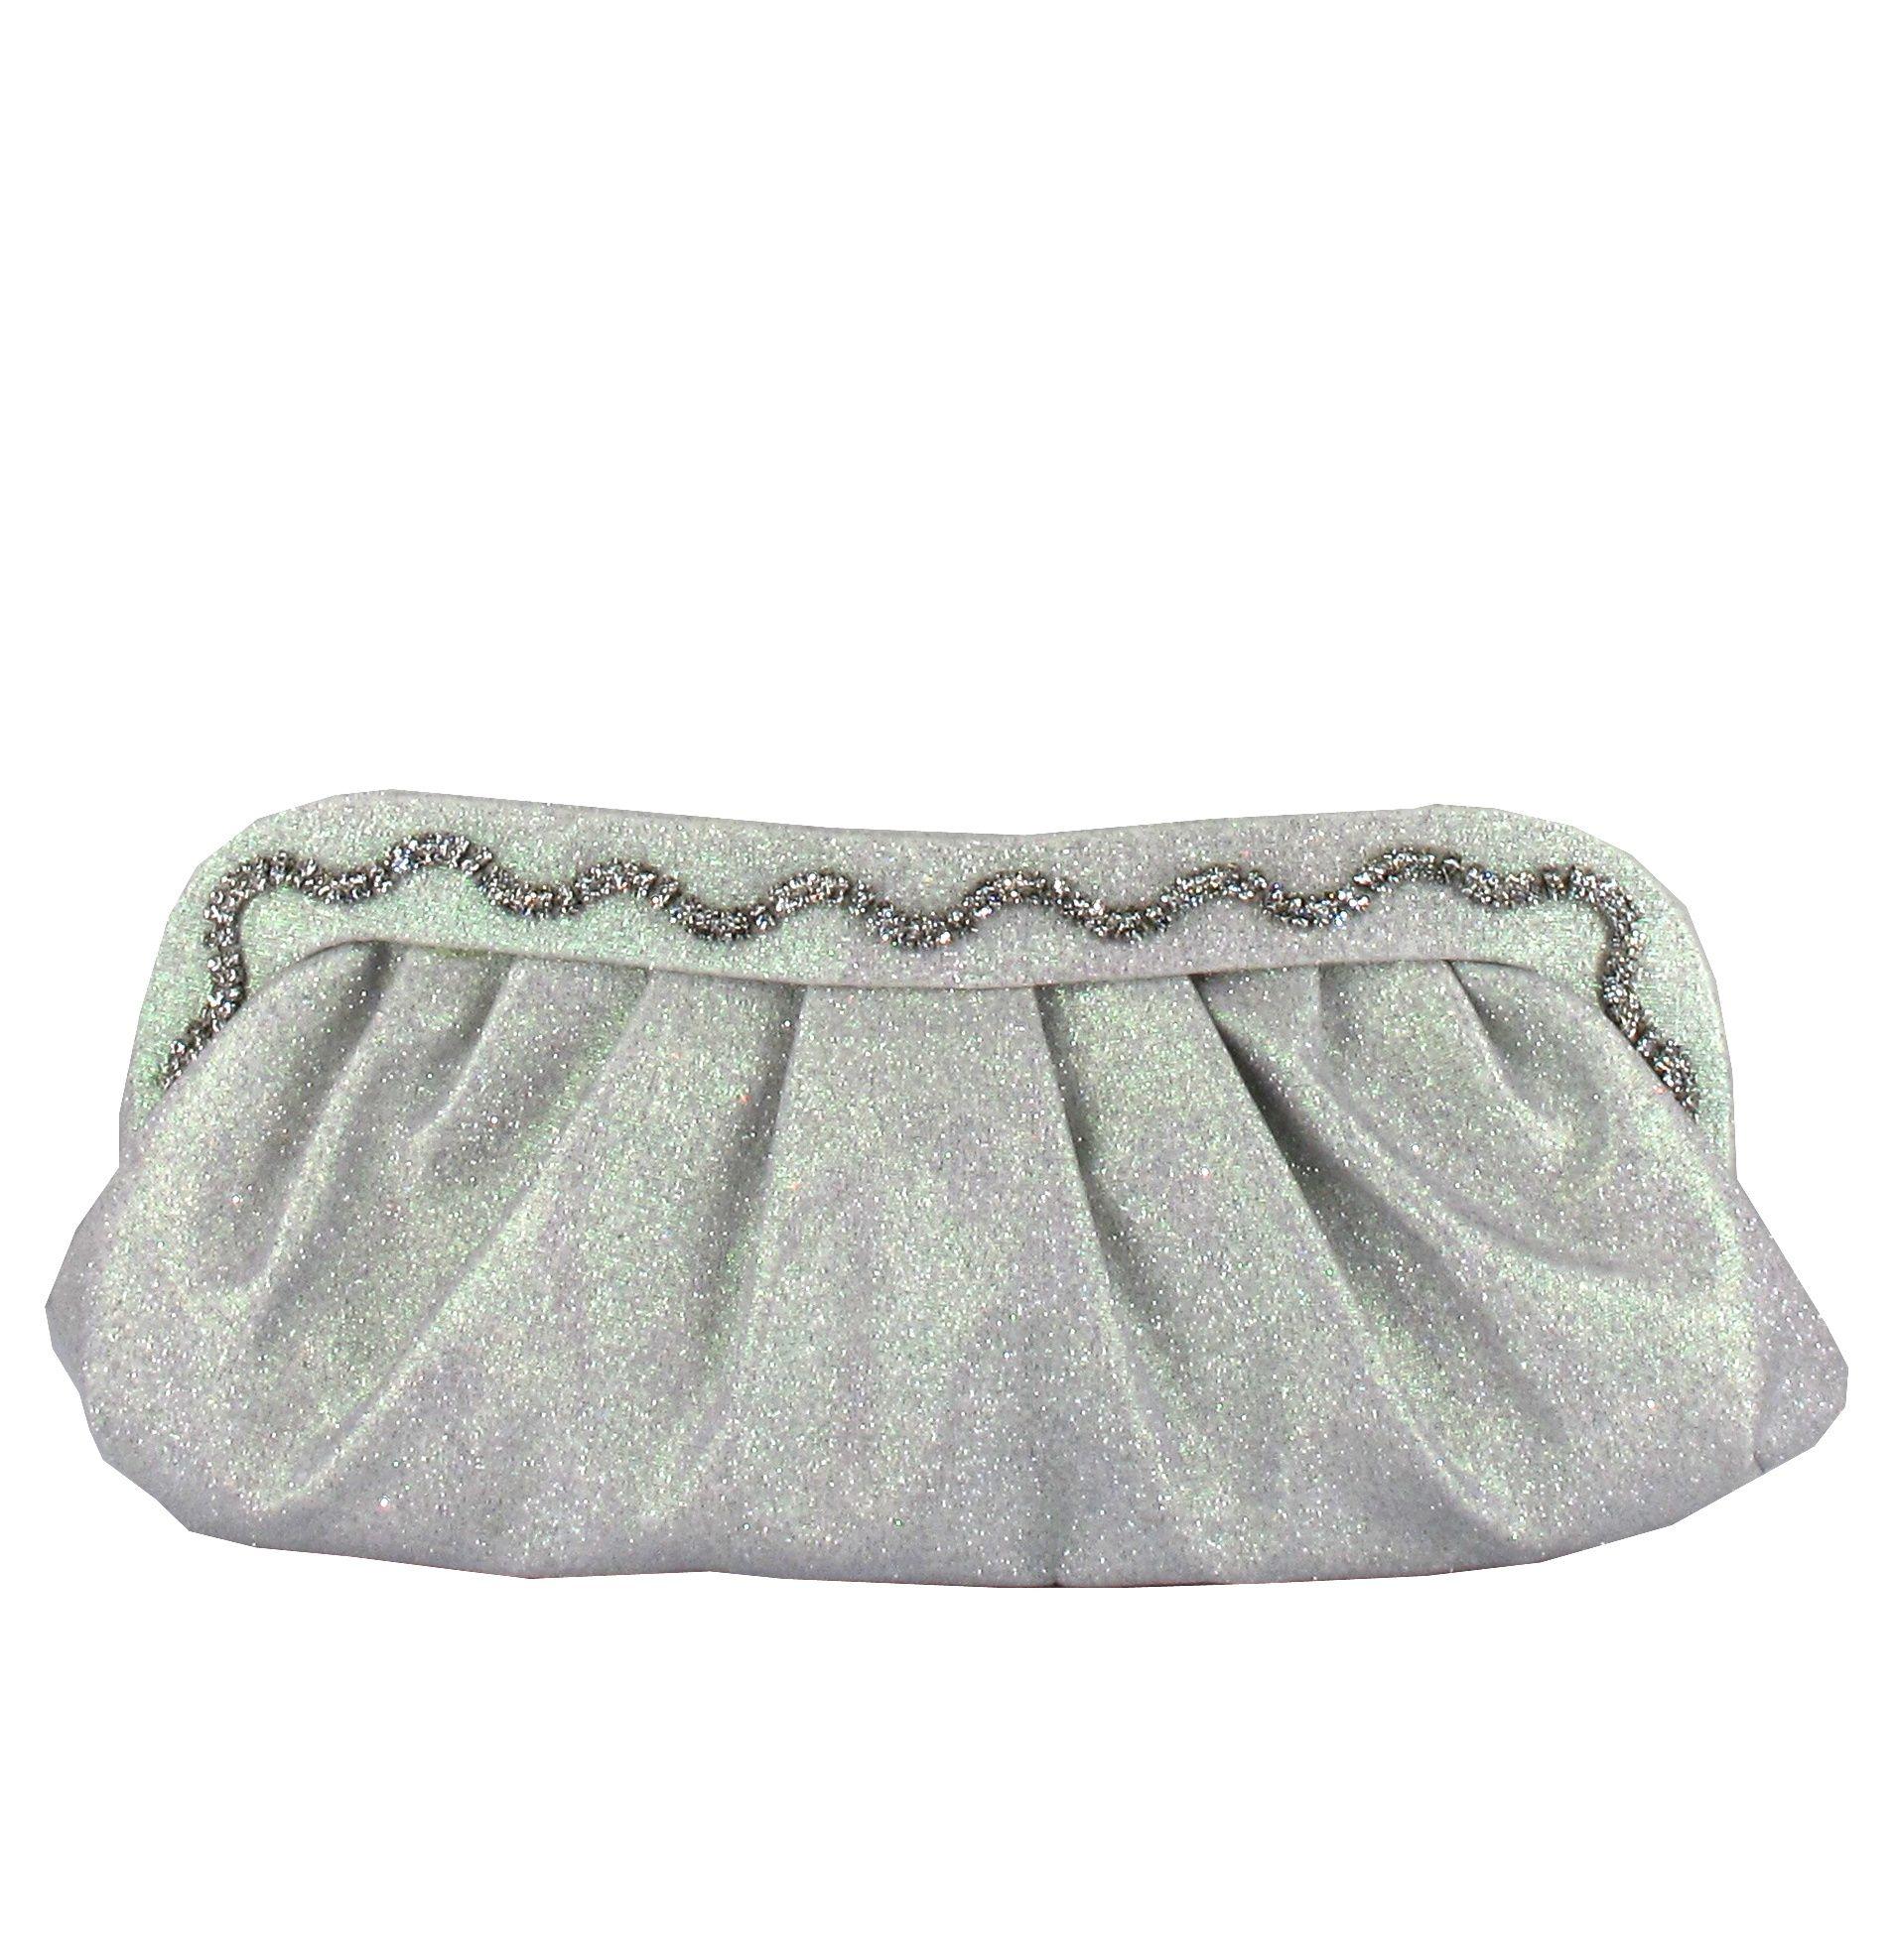 Bolso de novia de Menbur (ref. 83698) Bridal handbag by Menbur (ref. 83698)